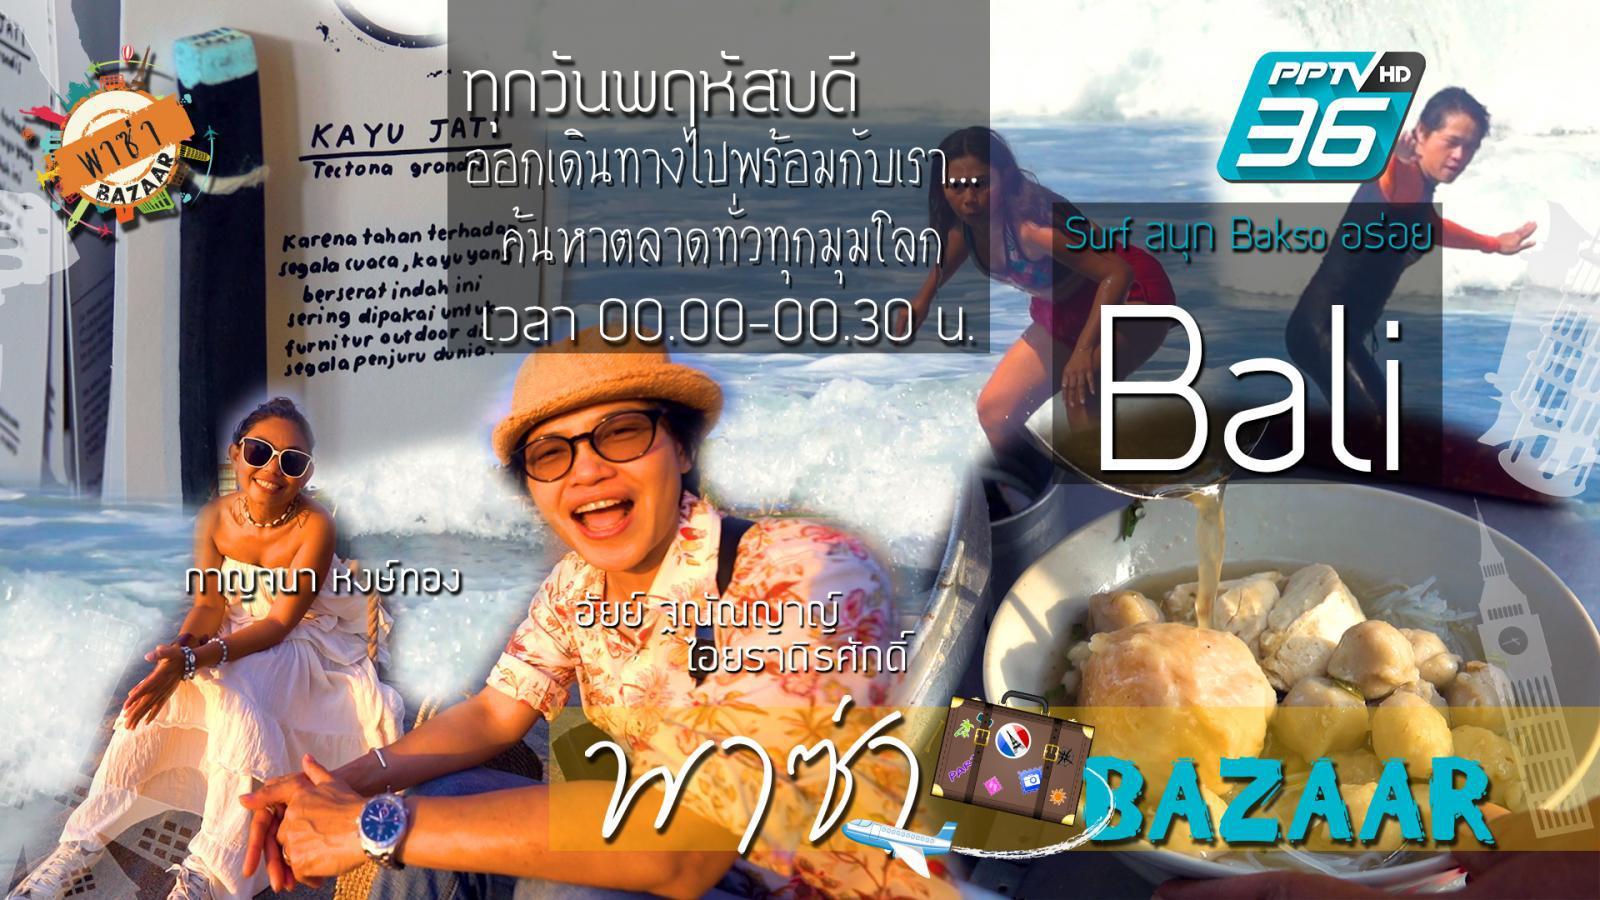 Surf สนุก Bakso อร่อย Bali